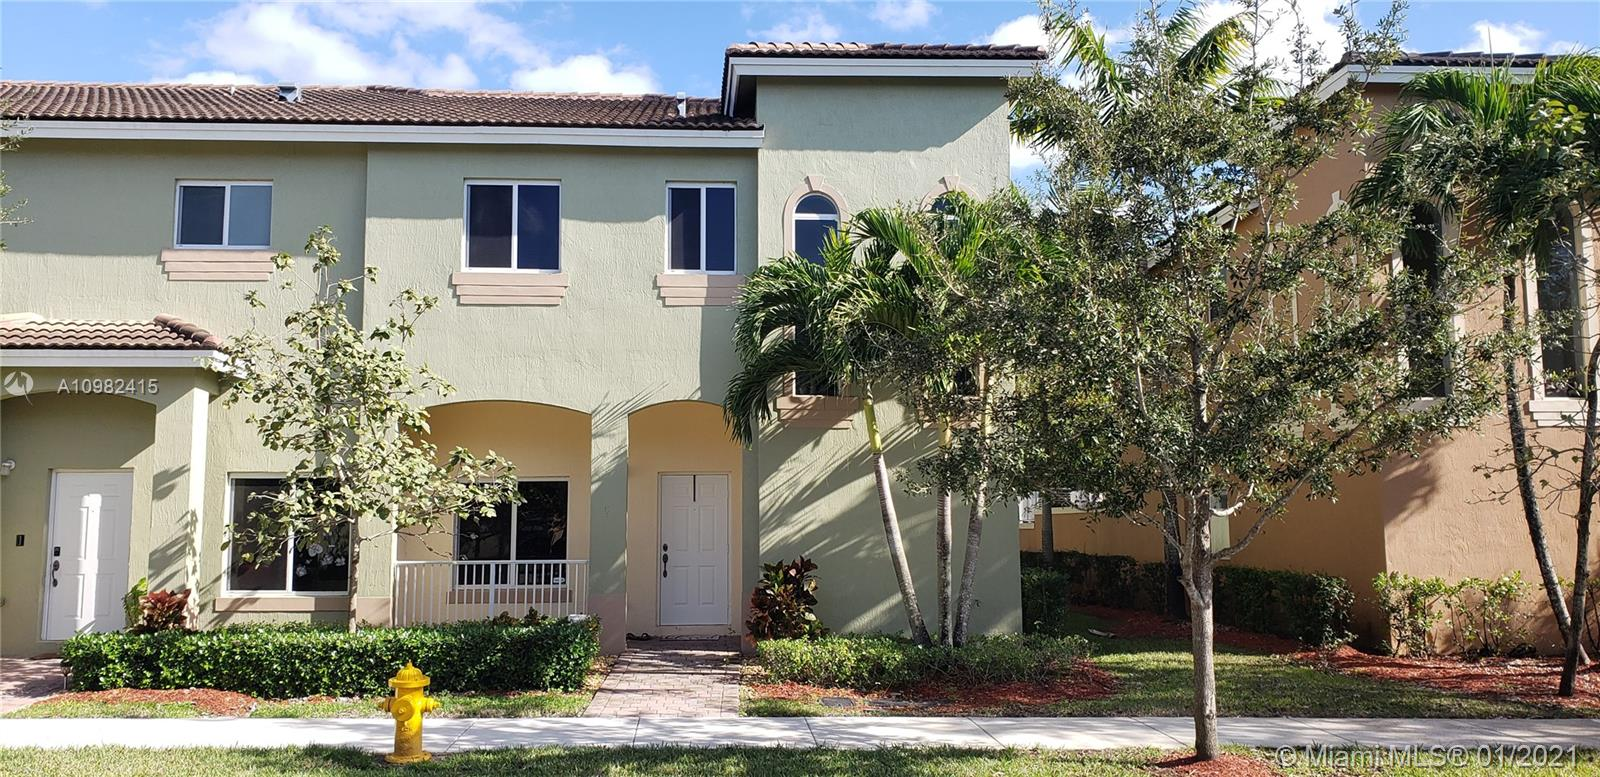 2358 SE 17th Ter Property Photo - Homestead, FL real estate listing